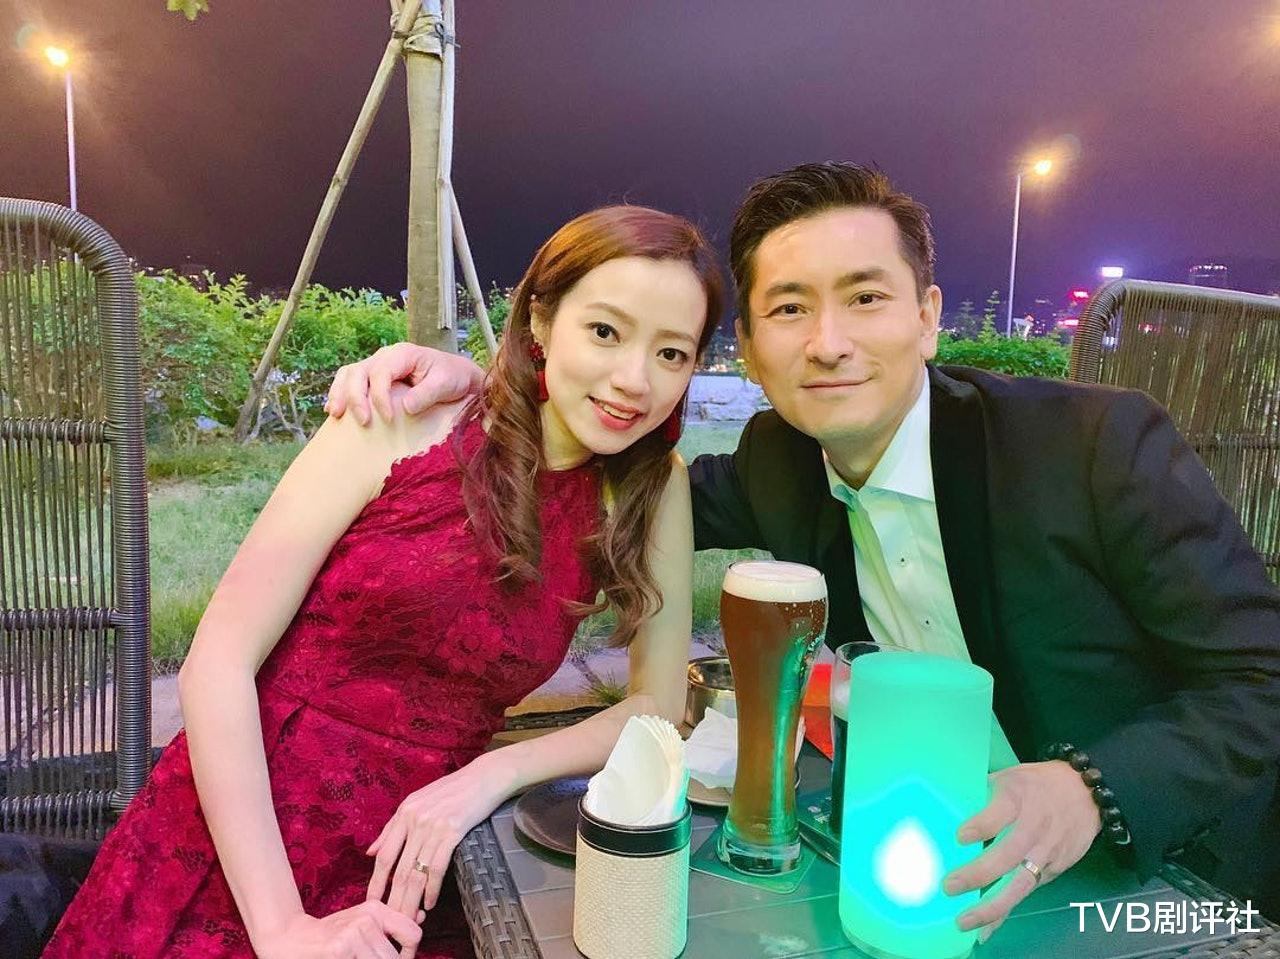 TVB離巢男星因疫情虧損百萬 自爆跟太太結婚九年不生育原因-圖5